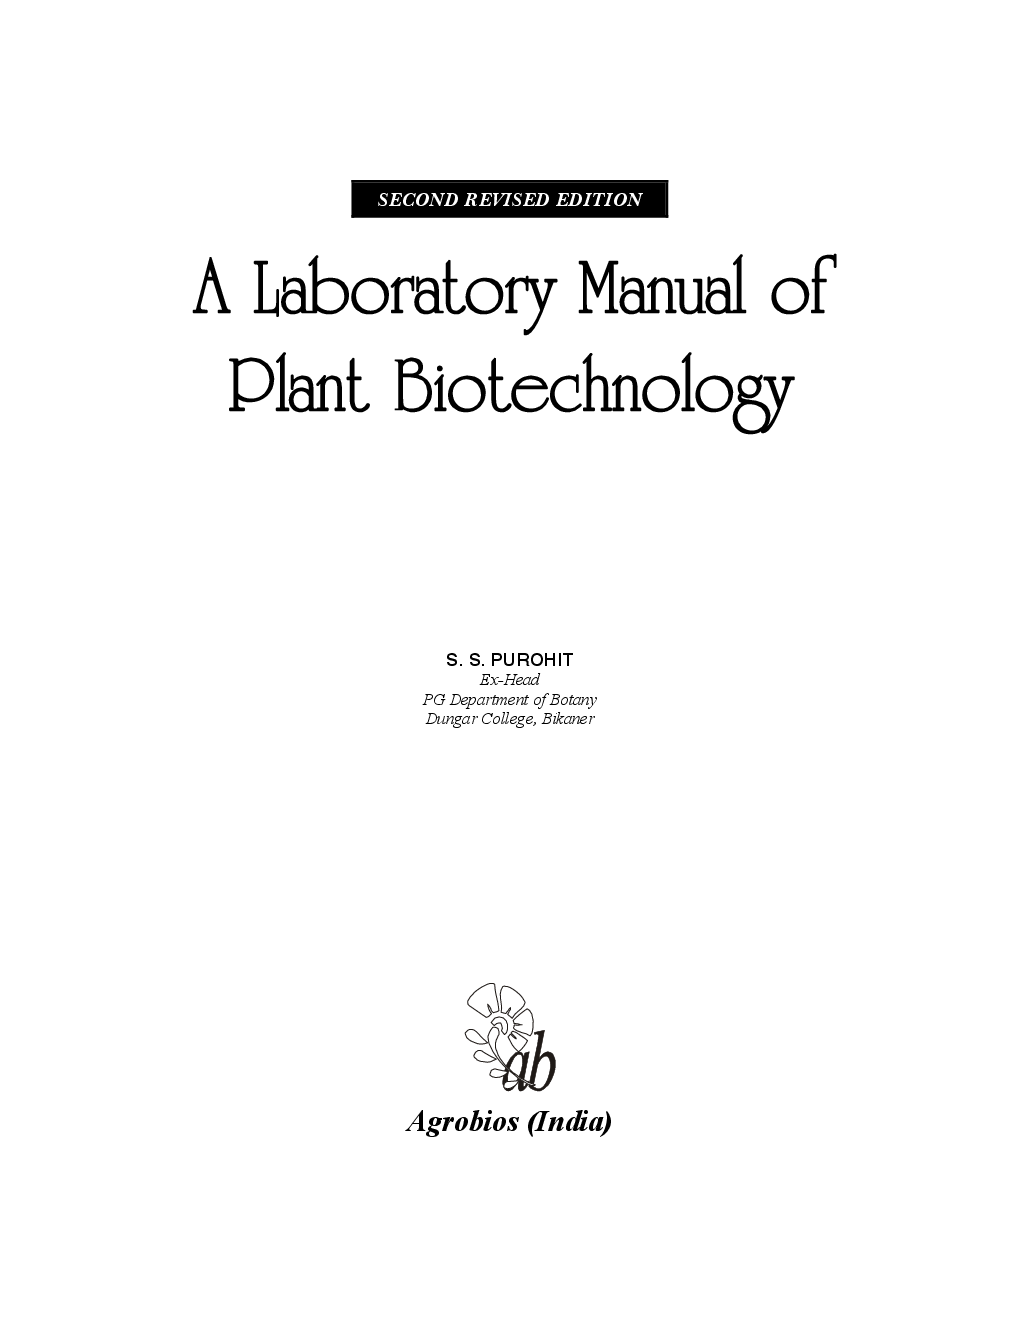 plant biotechnology practical manual pdf